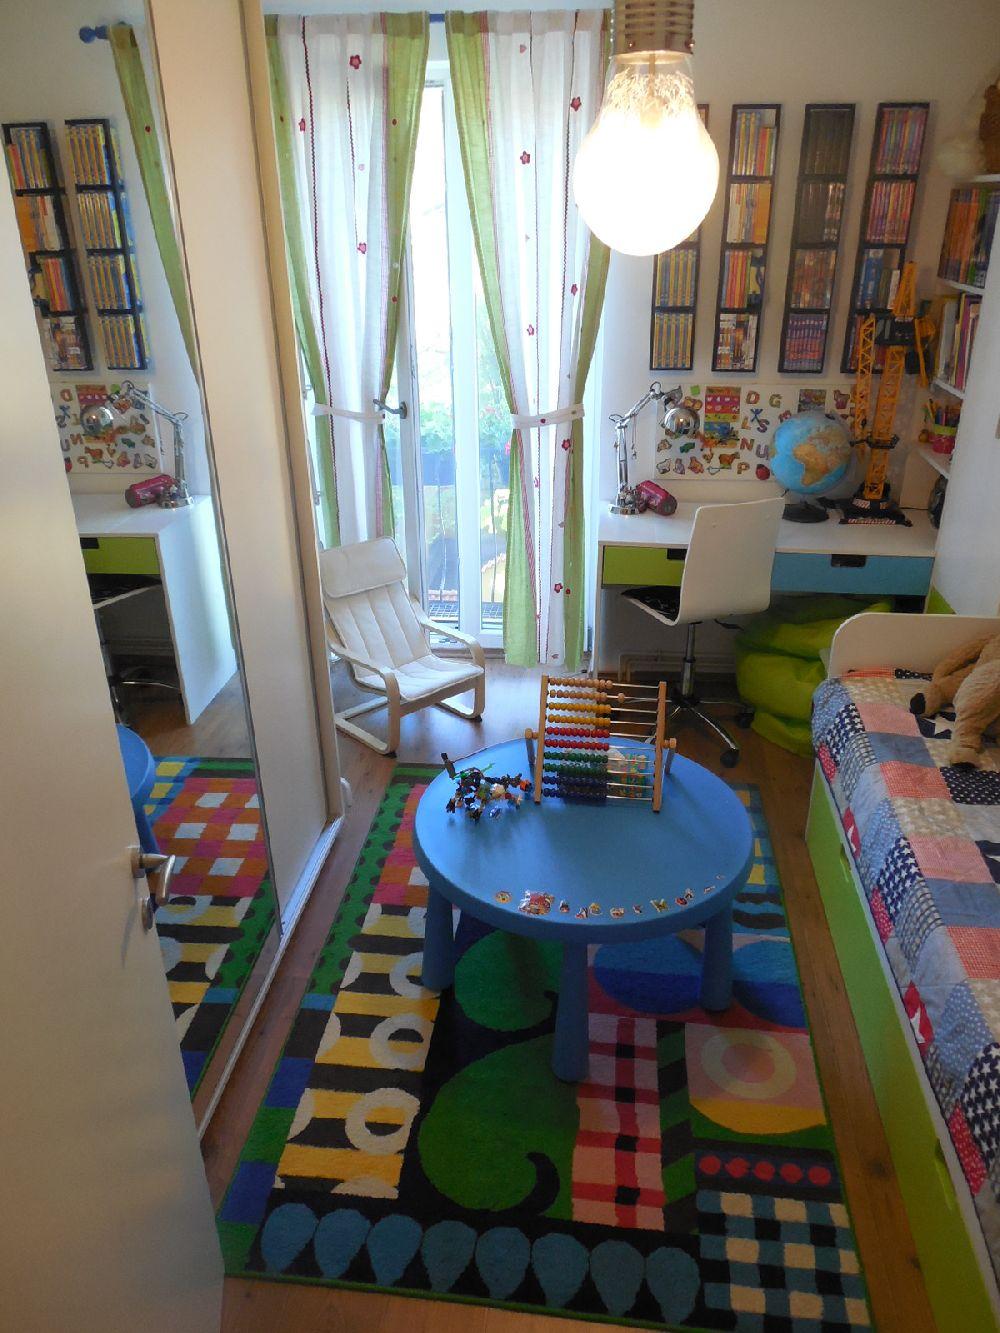 adelaparvu.com despre amenajare apartament 3 camere Bucuresti, design interior Iulia Banu (3)